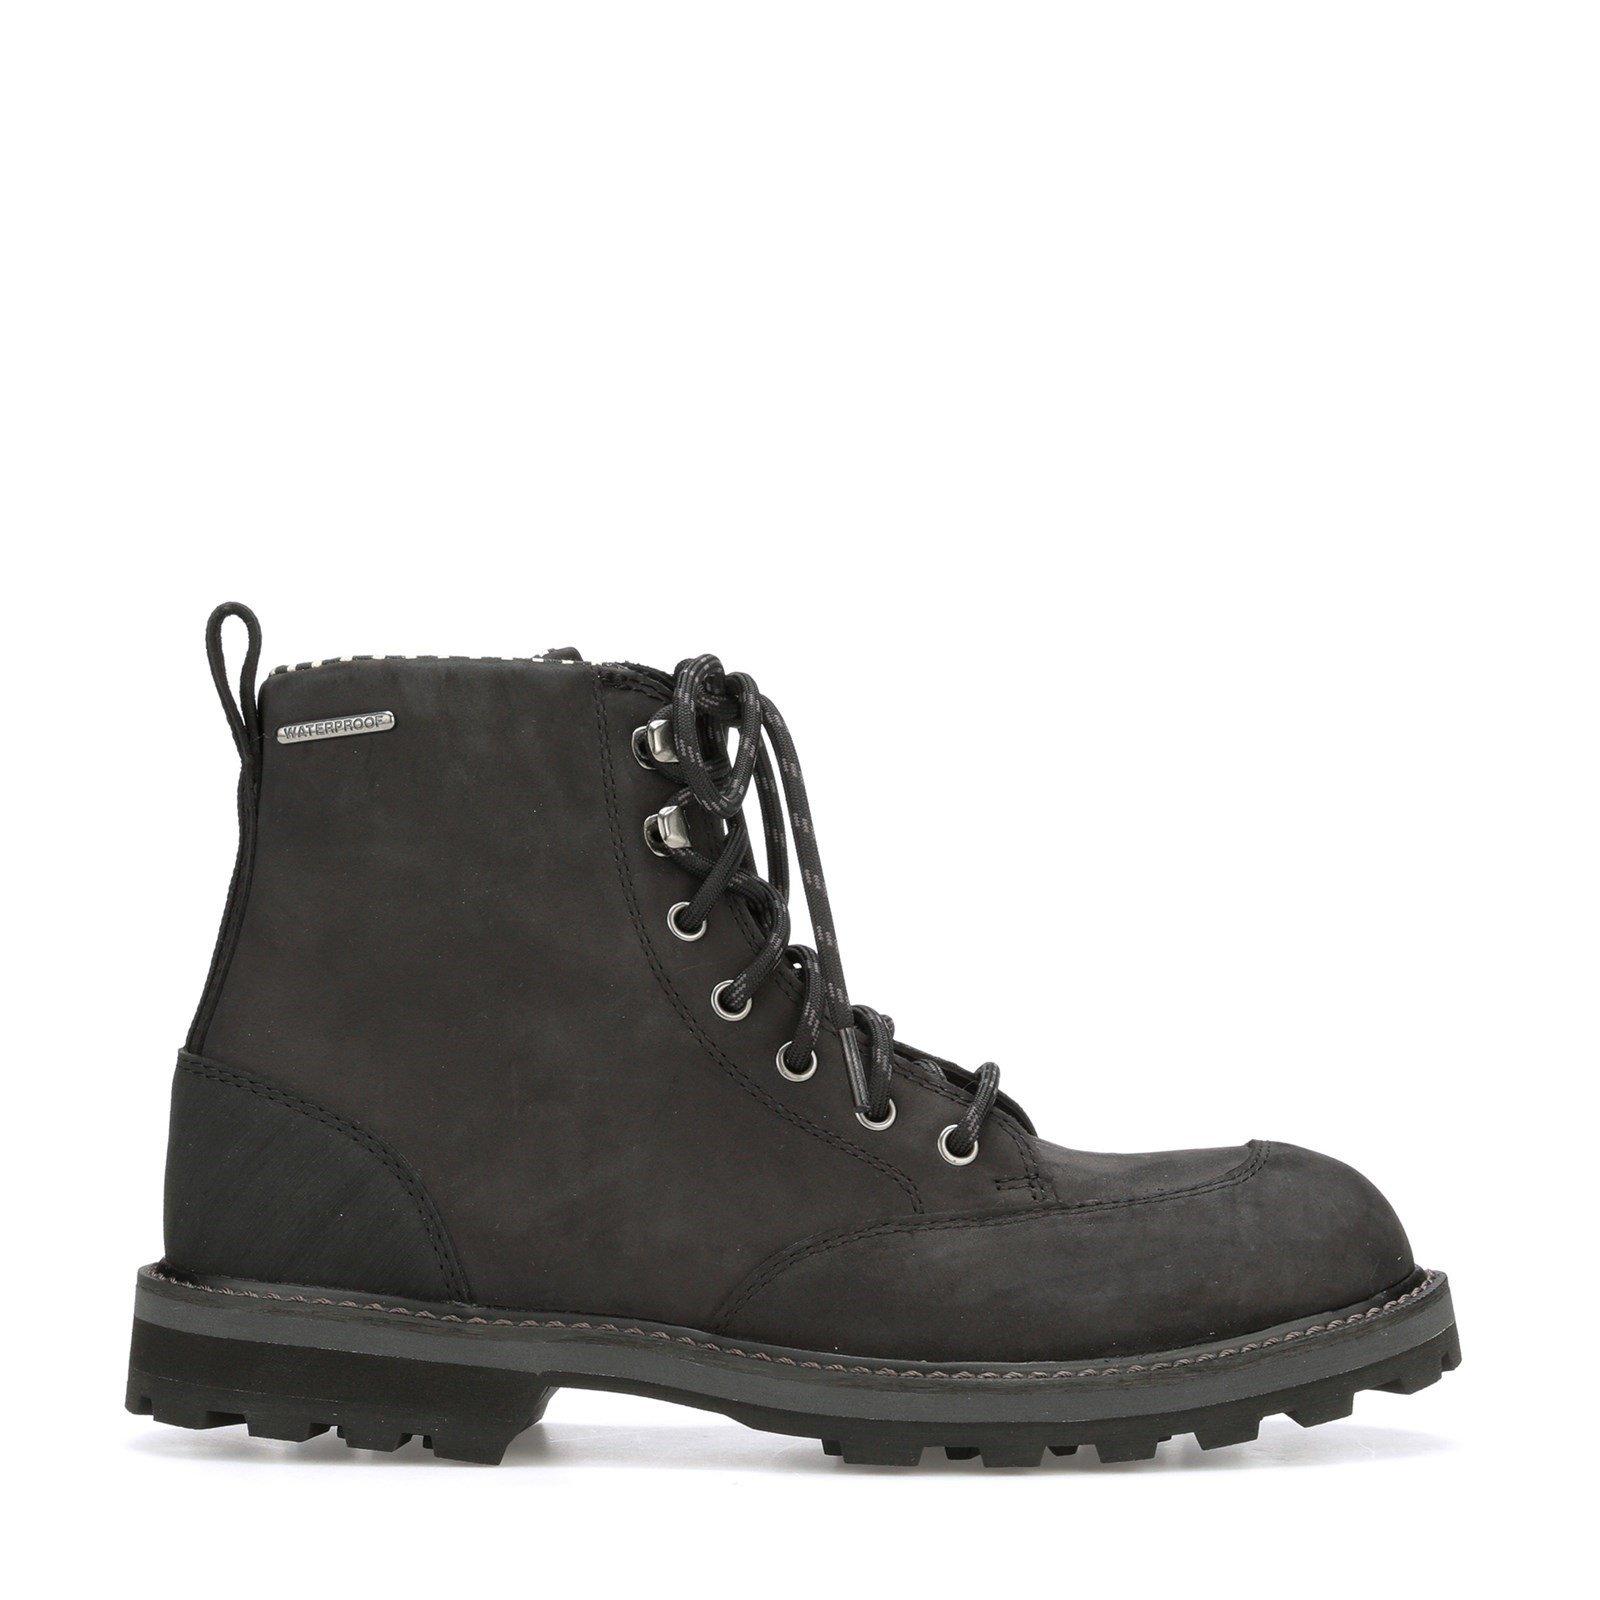 Muck Boots Men's Foreman Boot Black 31854 - Black 7